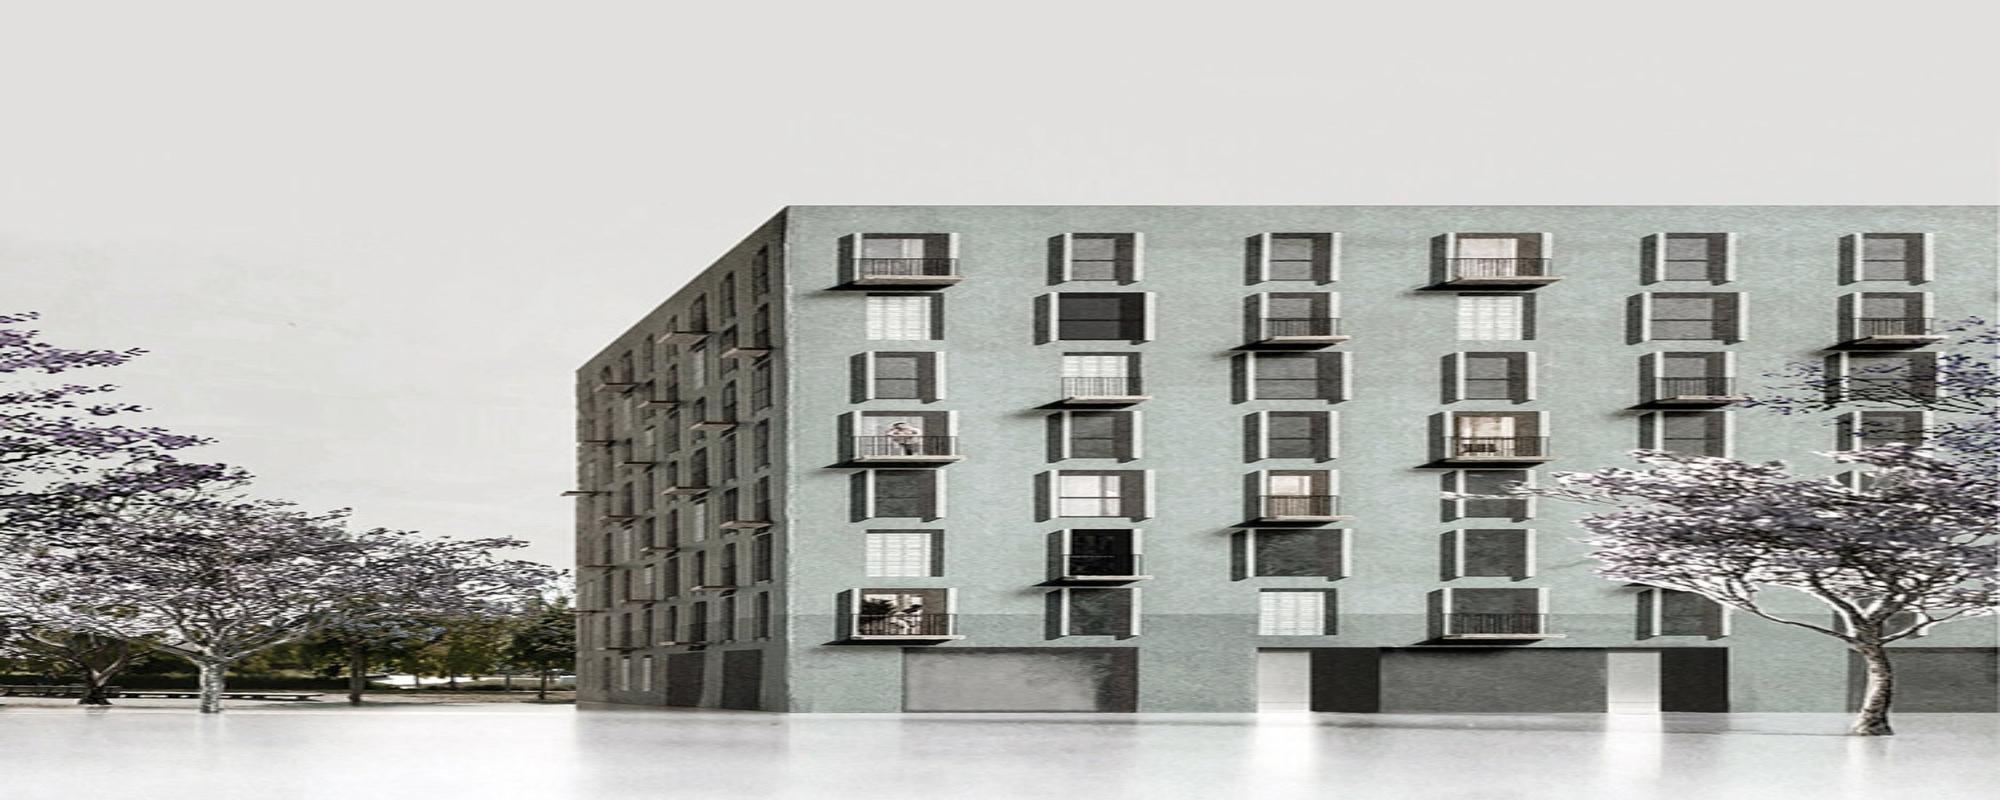 Estudio de Arquitectura: JAAS crea proyectos lujuosos y inspiracionales estudio de arquitectura Estudio de Arquitectura: JAAS crea proyectos lujuosos y inspiracionales Featured 2